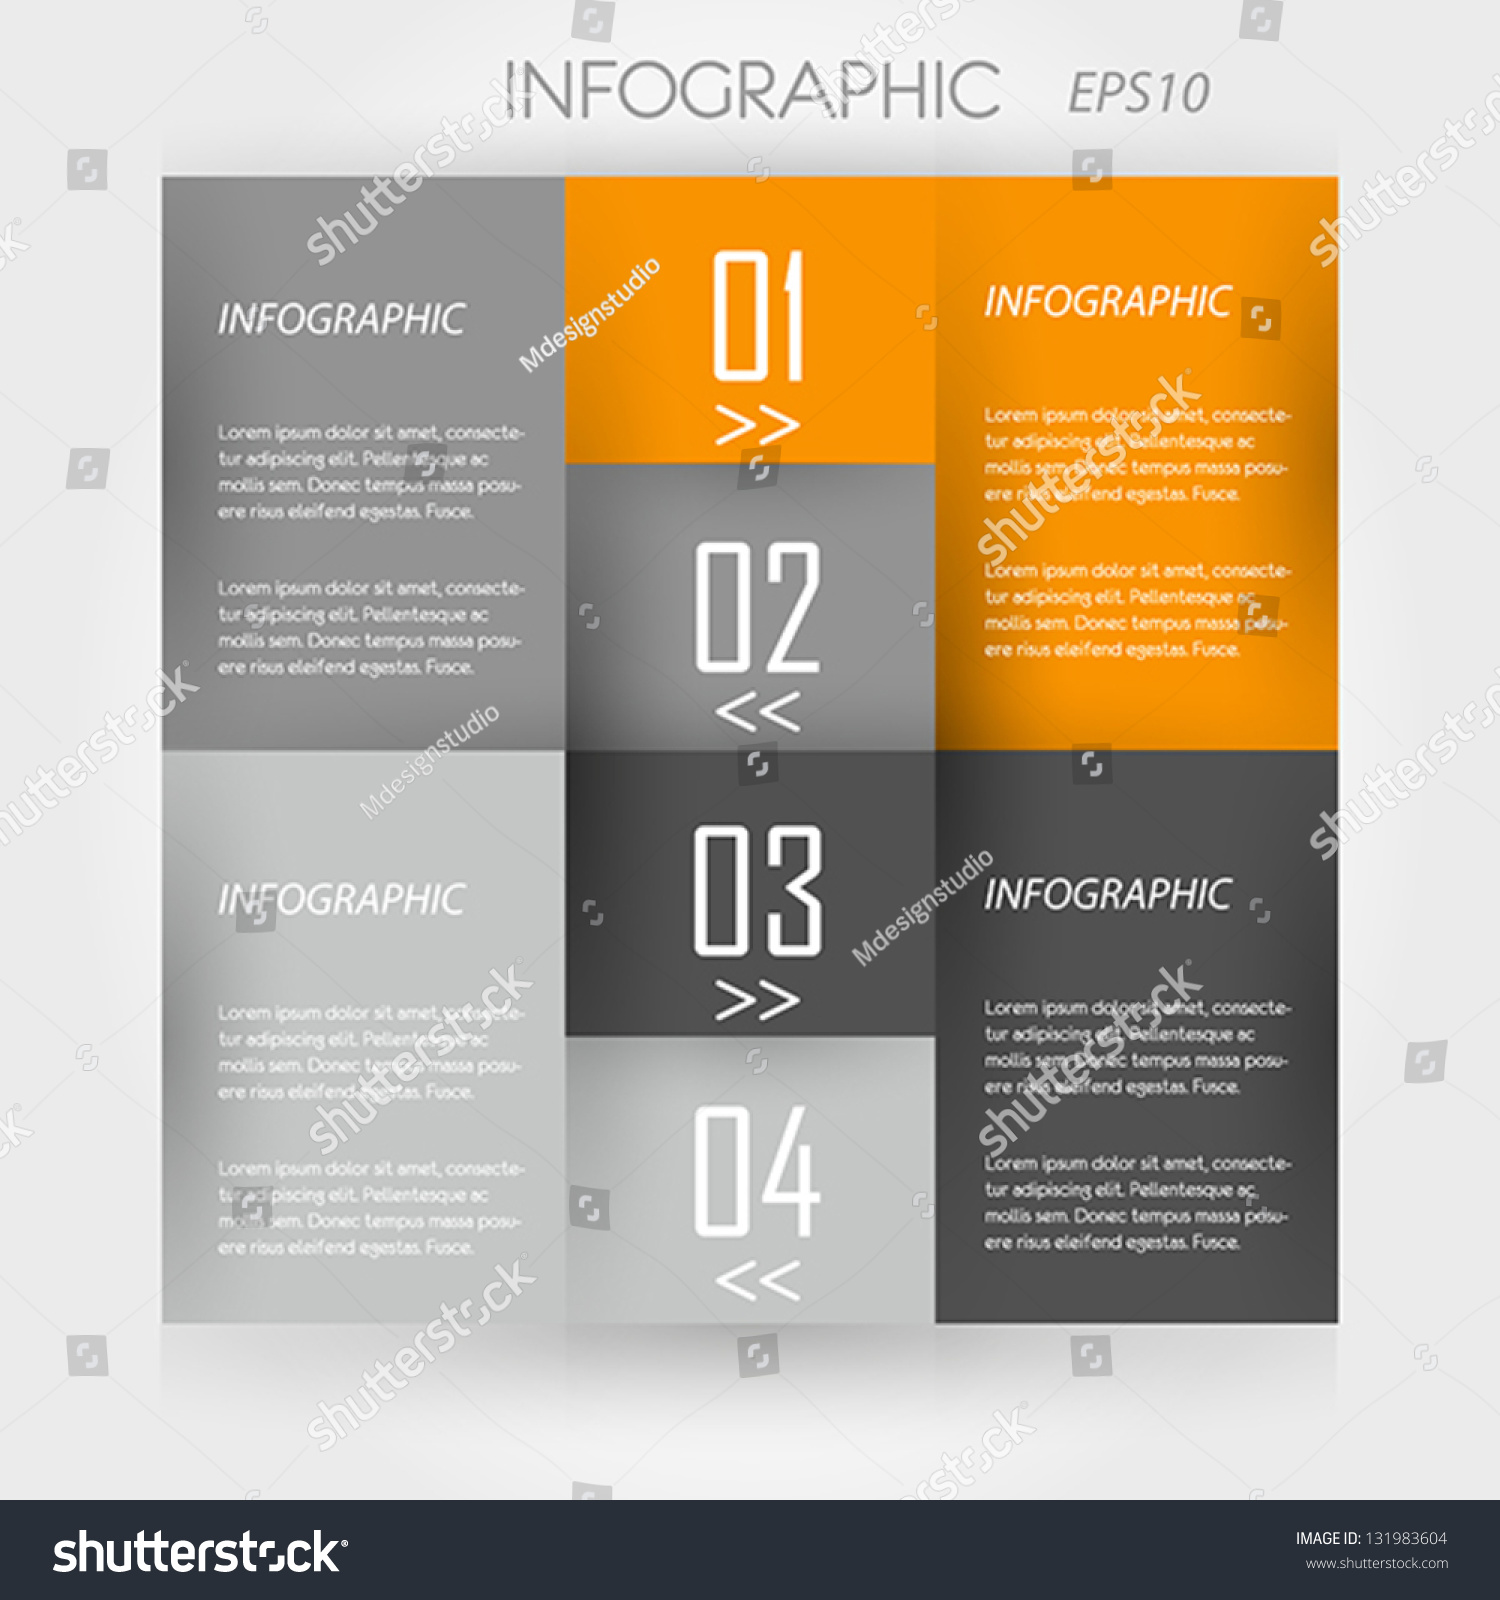 orange infographic 4 corners infographic concept ilustraci n vectorial en stock 131983604. Black Bedroom Furniture Sets. Home Design Ideas